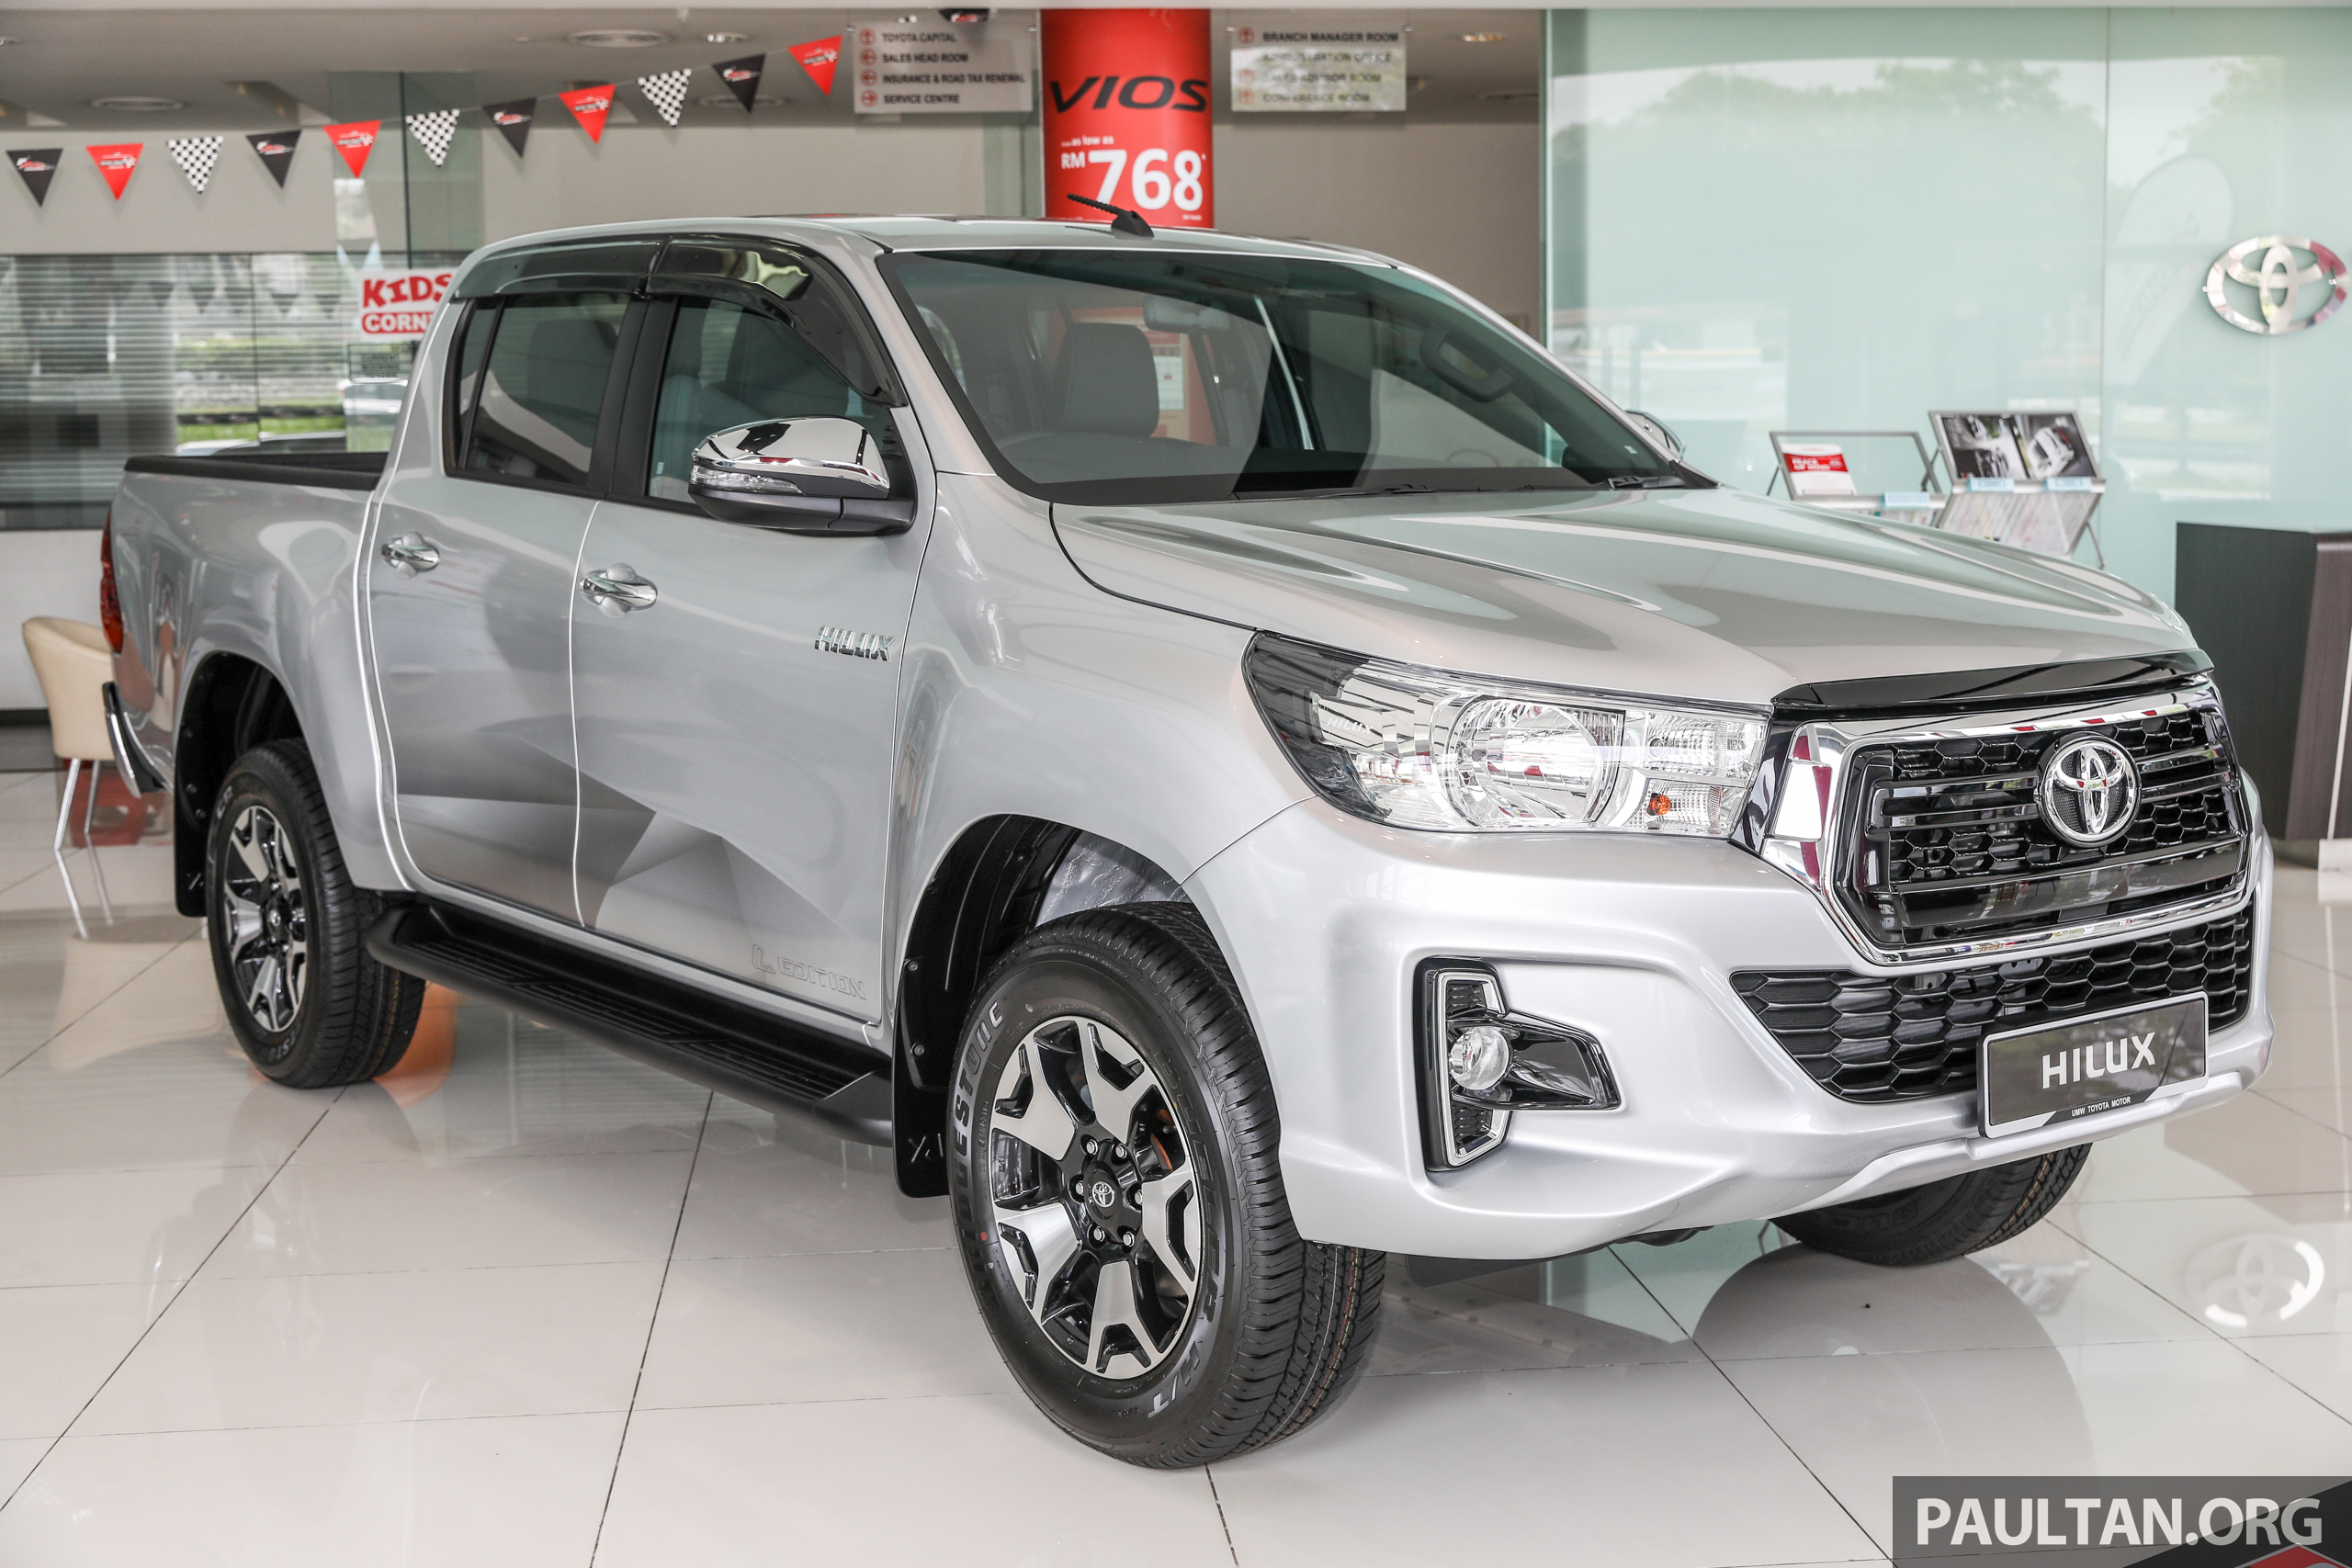 Kekurangan Harga Toyota Hilux Harga